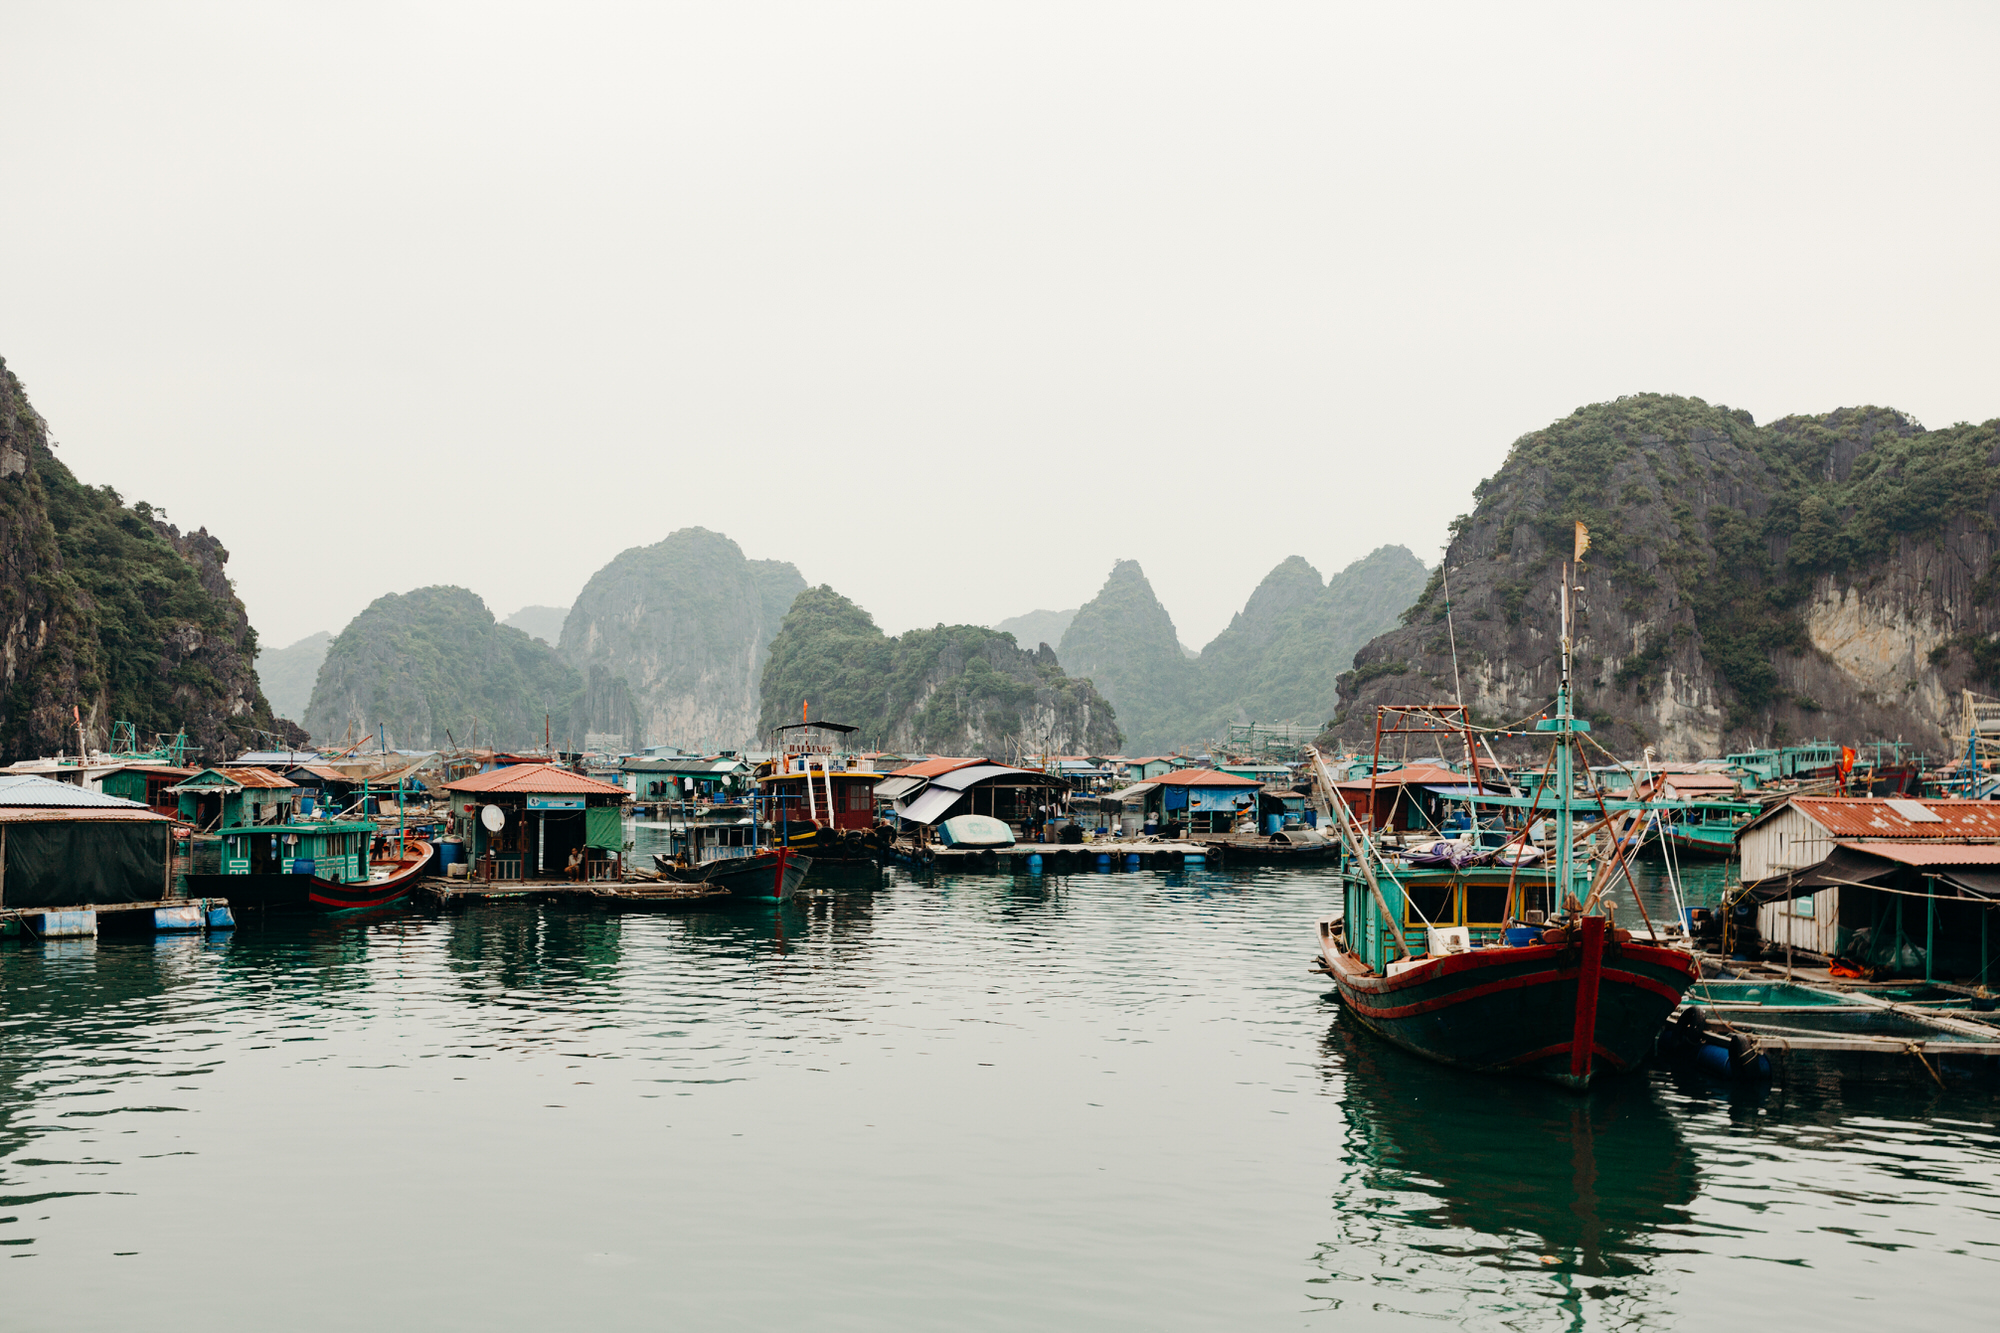 catbanationalparkvietnamfishingvillage.jpg